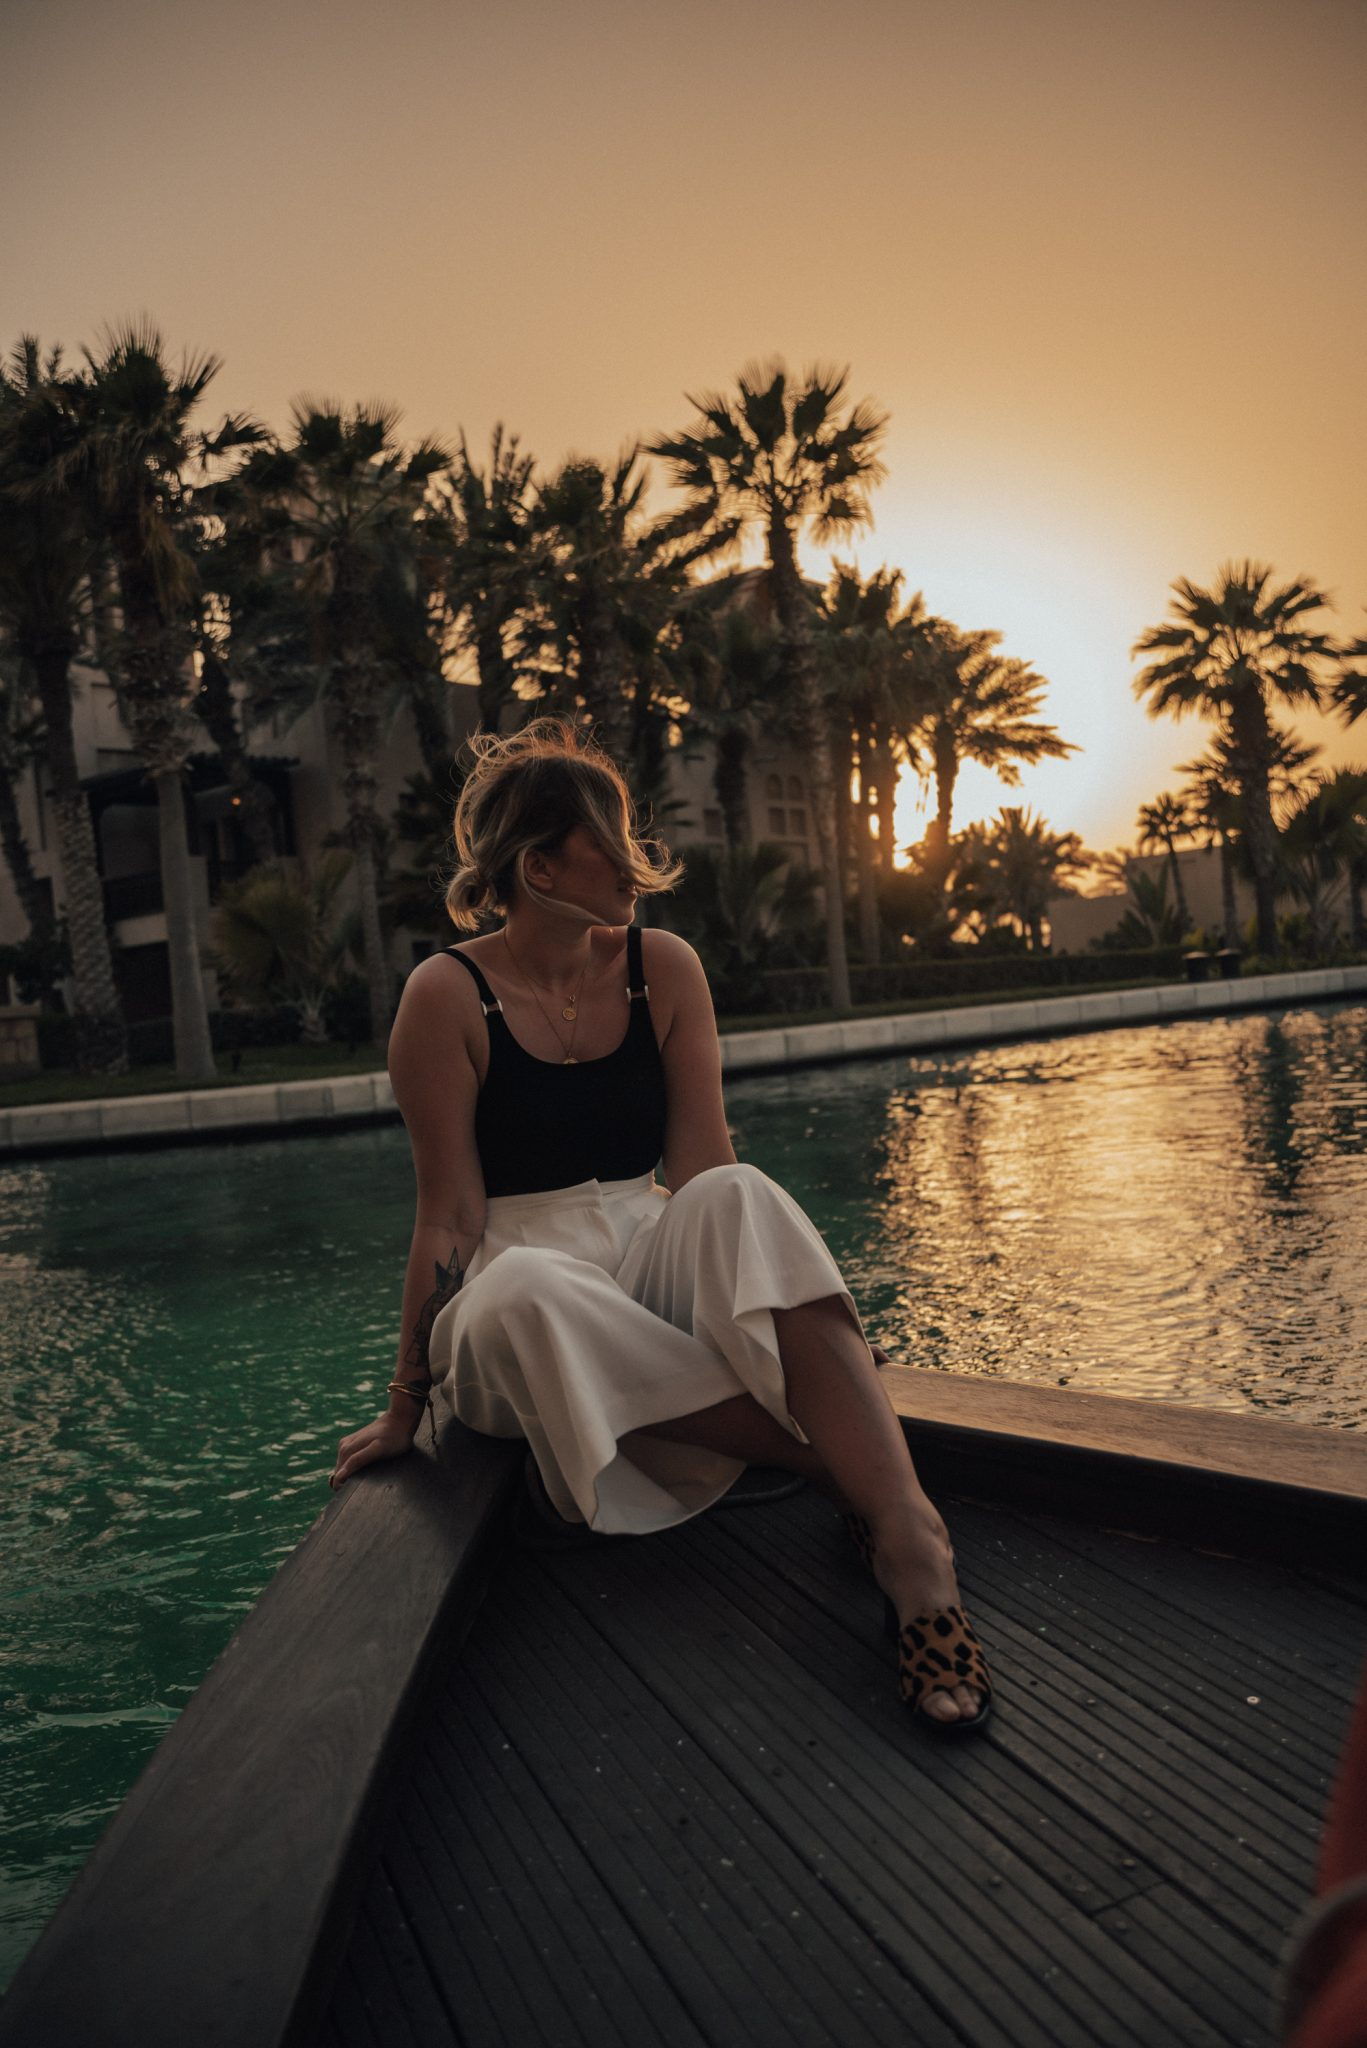 Image for Where to stay in Dubai  || Jumeirah Al Qasr [5 Star Luxury Hotel]